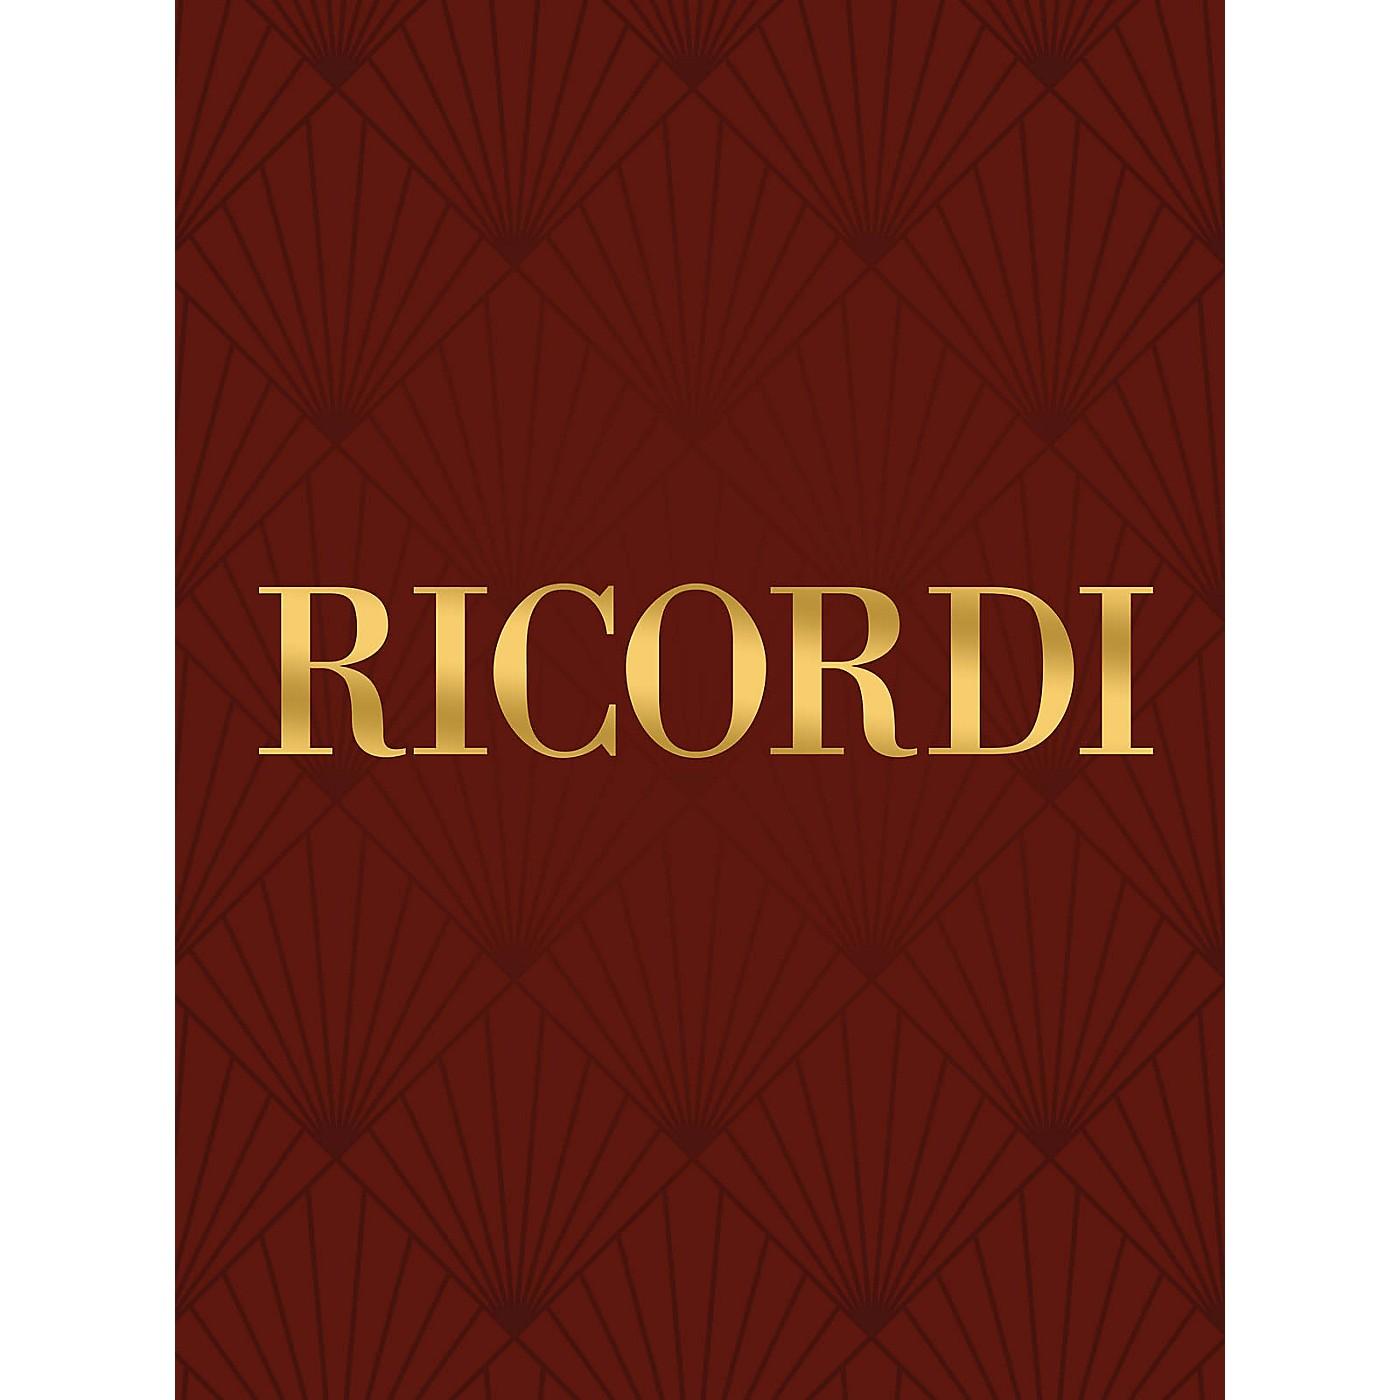 Ricordi Introduzione e Allegro, Op. 40 (Flute and Piano) Woodwind Solo Series Composed by Luigi Cortese thumbnail